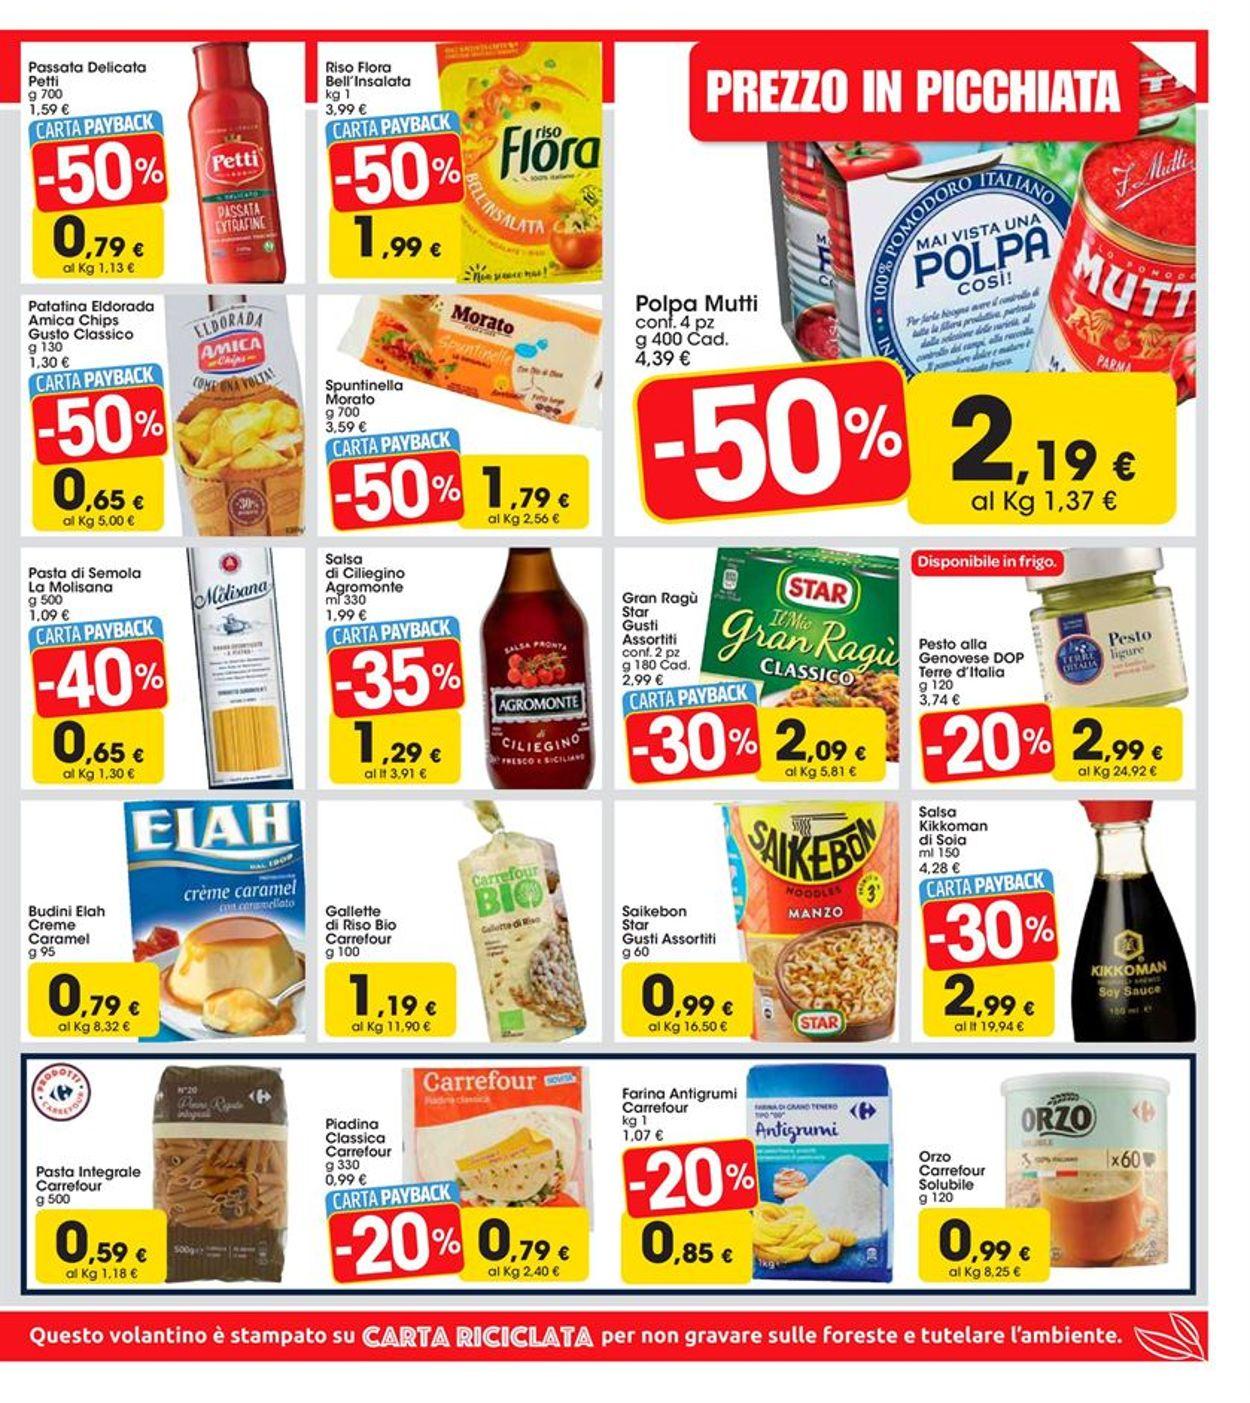 Volantino Carrefour - Offerte 06/06-19/06/2019 (Pagina 5)